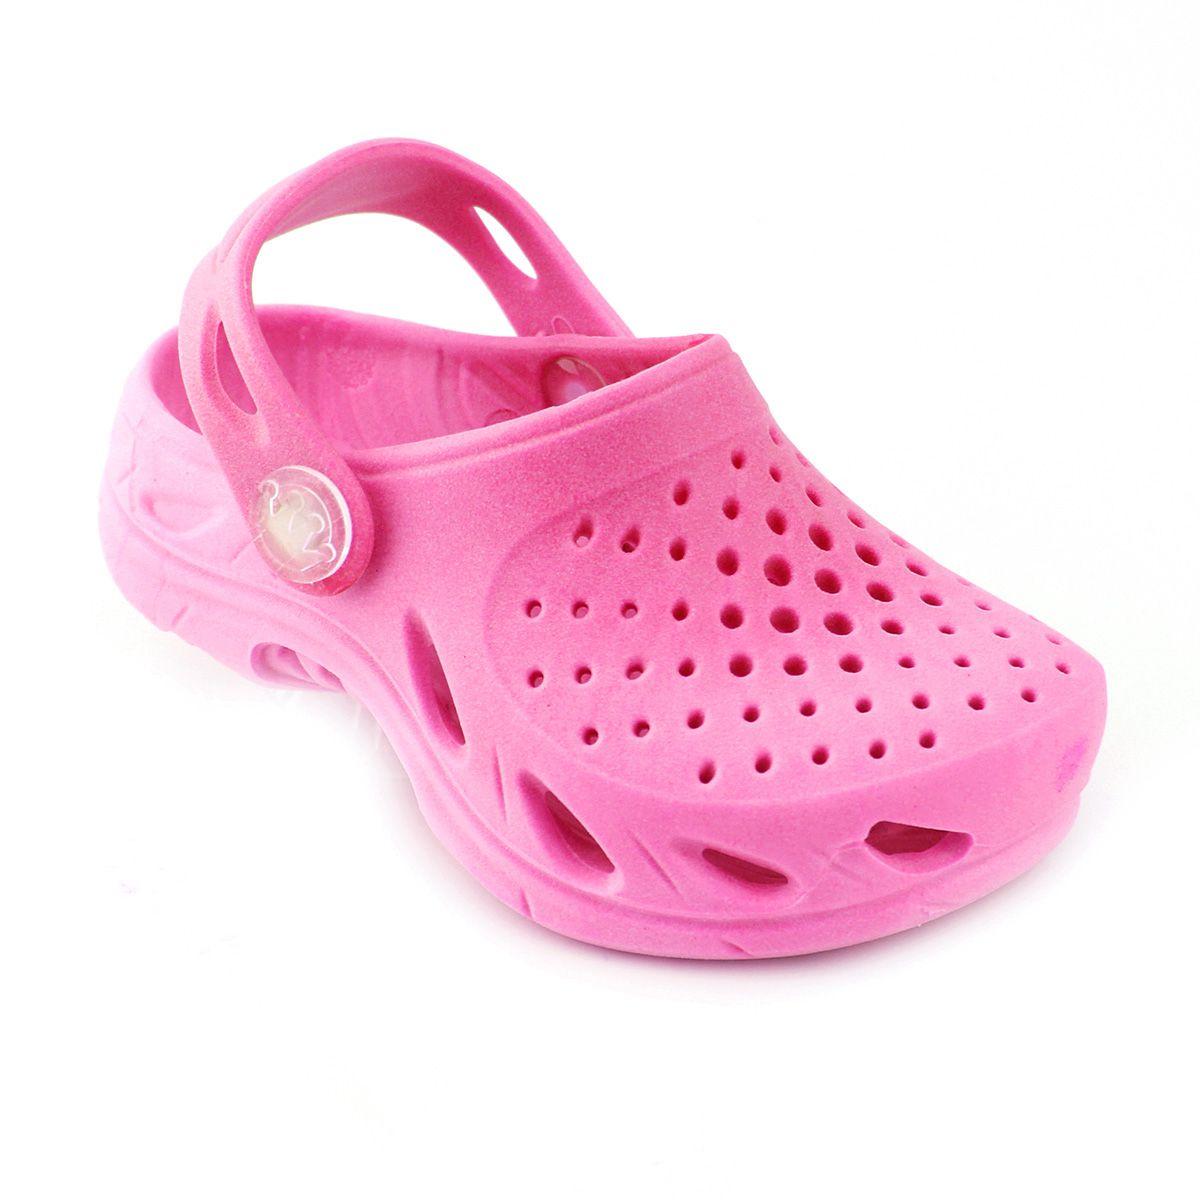 Babuche Plugt Ventor Baby Neon Pink